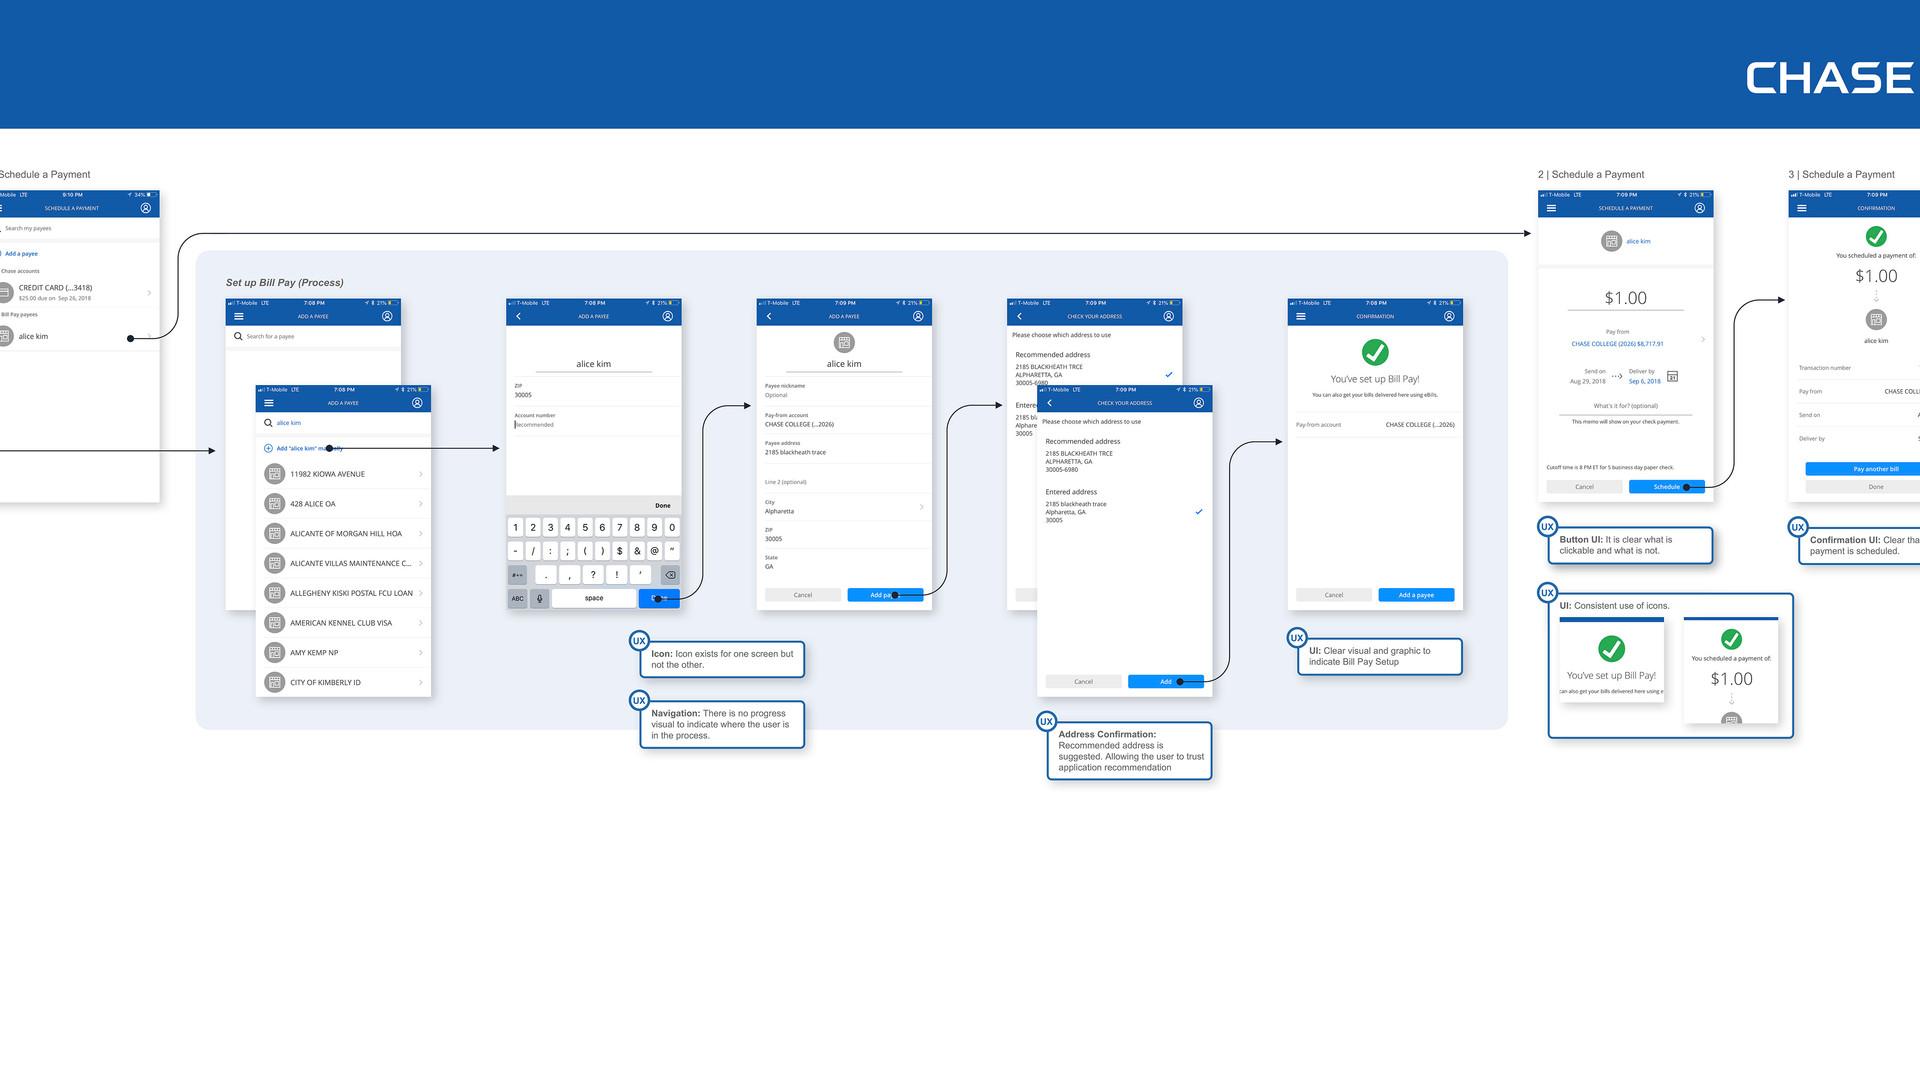 Chase App - User Flows (dragged) 3.jpg